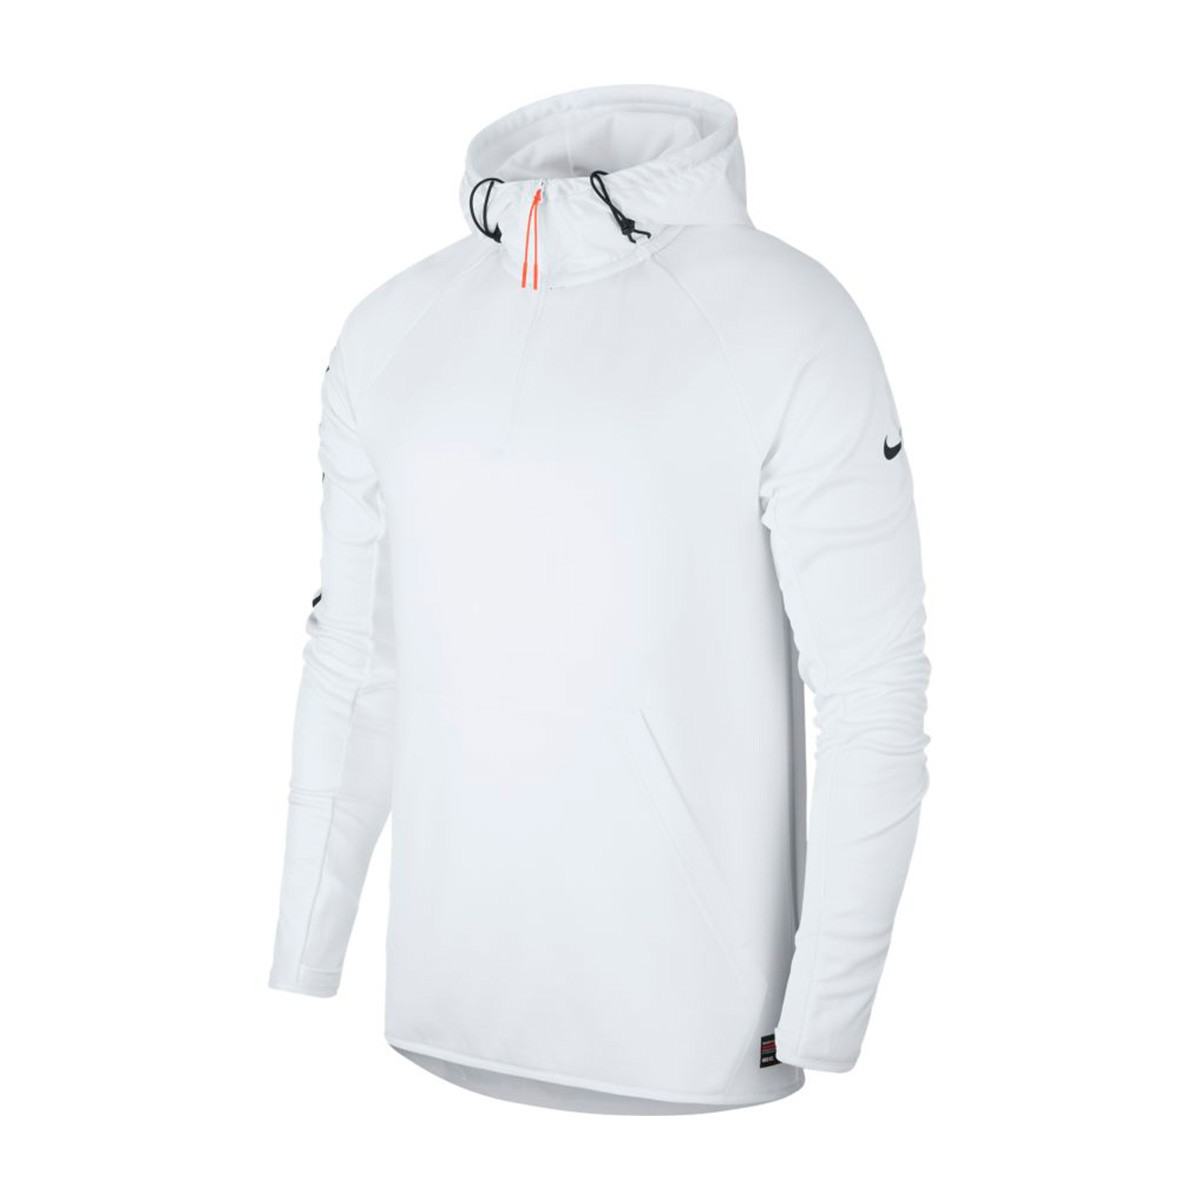 Nike Sudadera F Ahora Fútbol White c Es Soloporteros Black qqrdU0nx